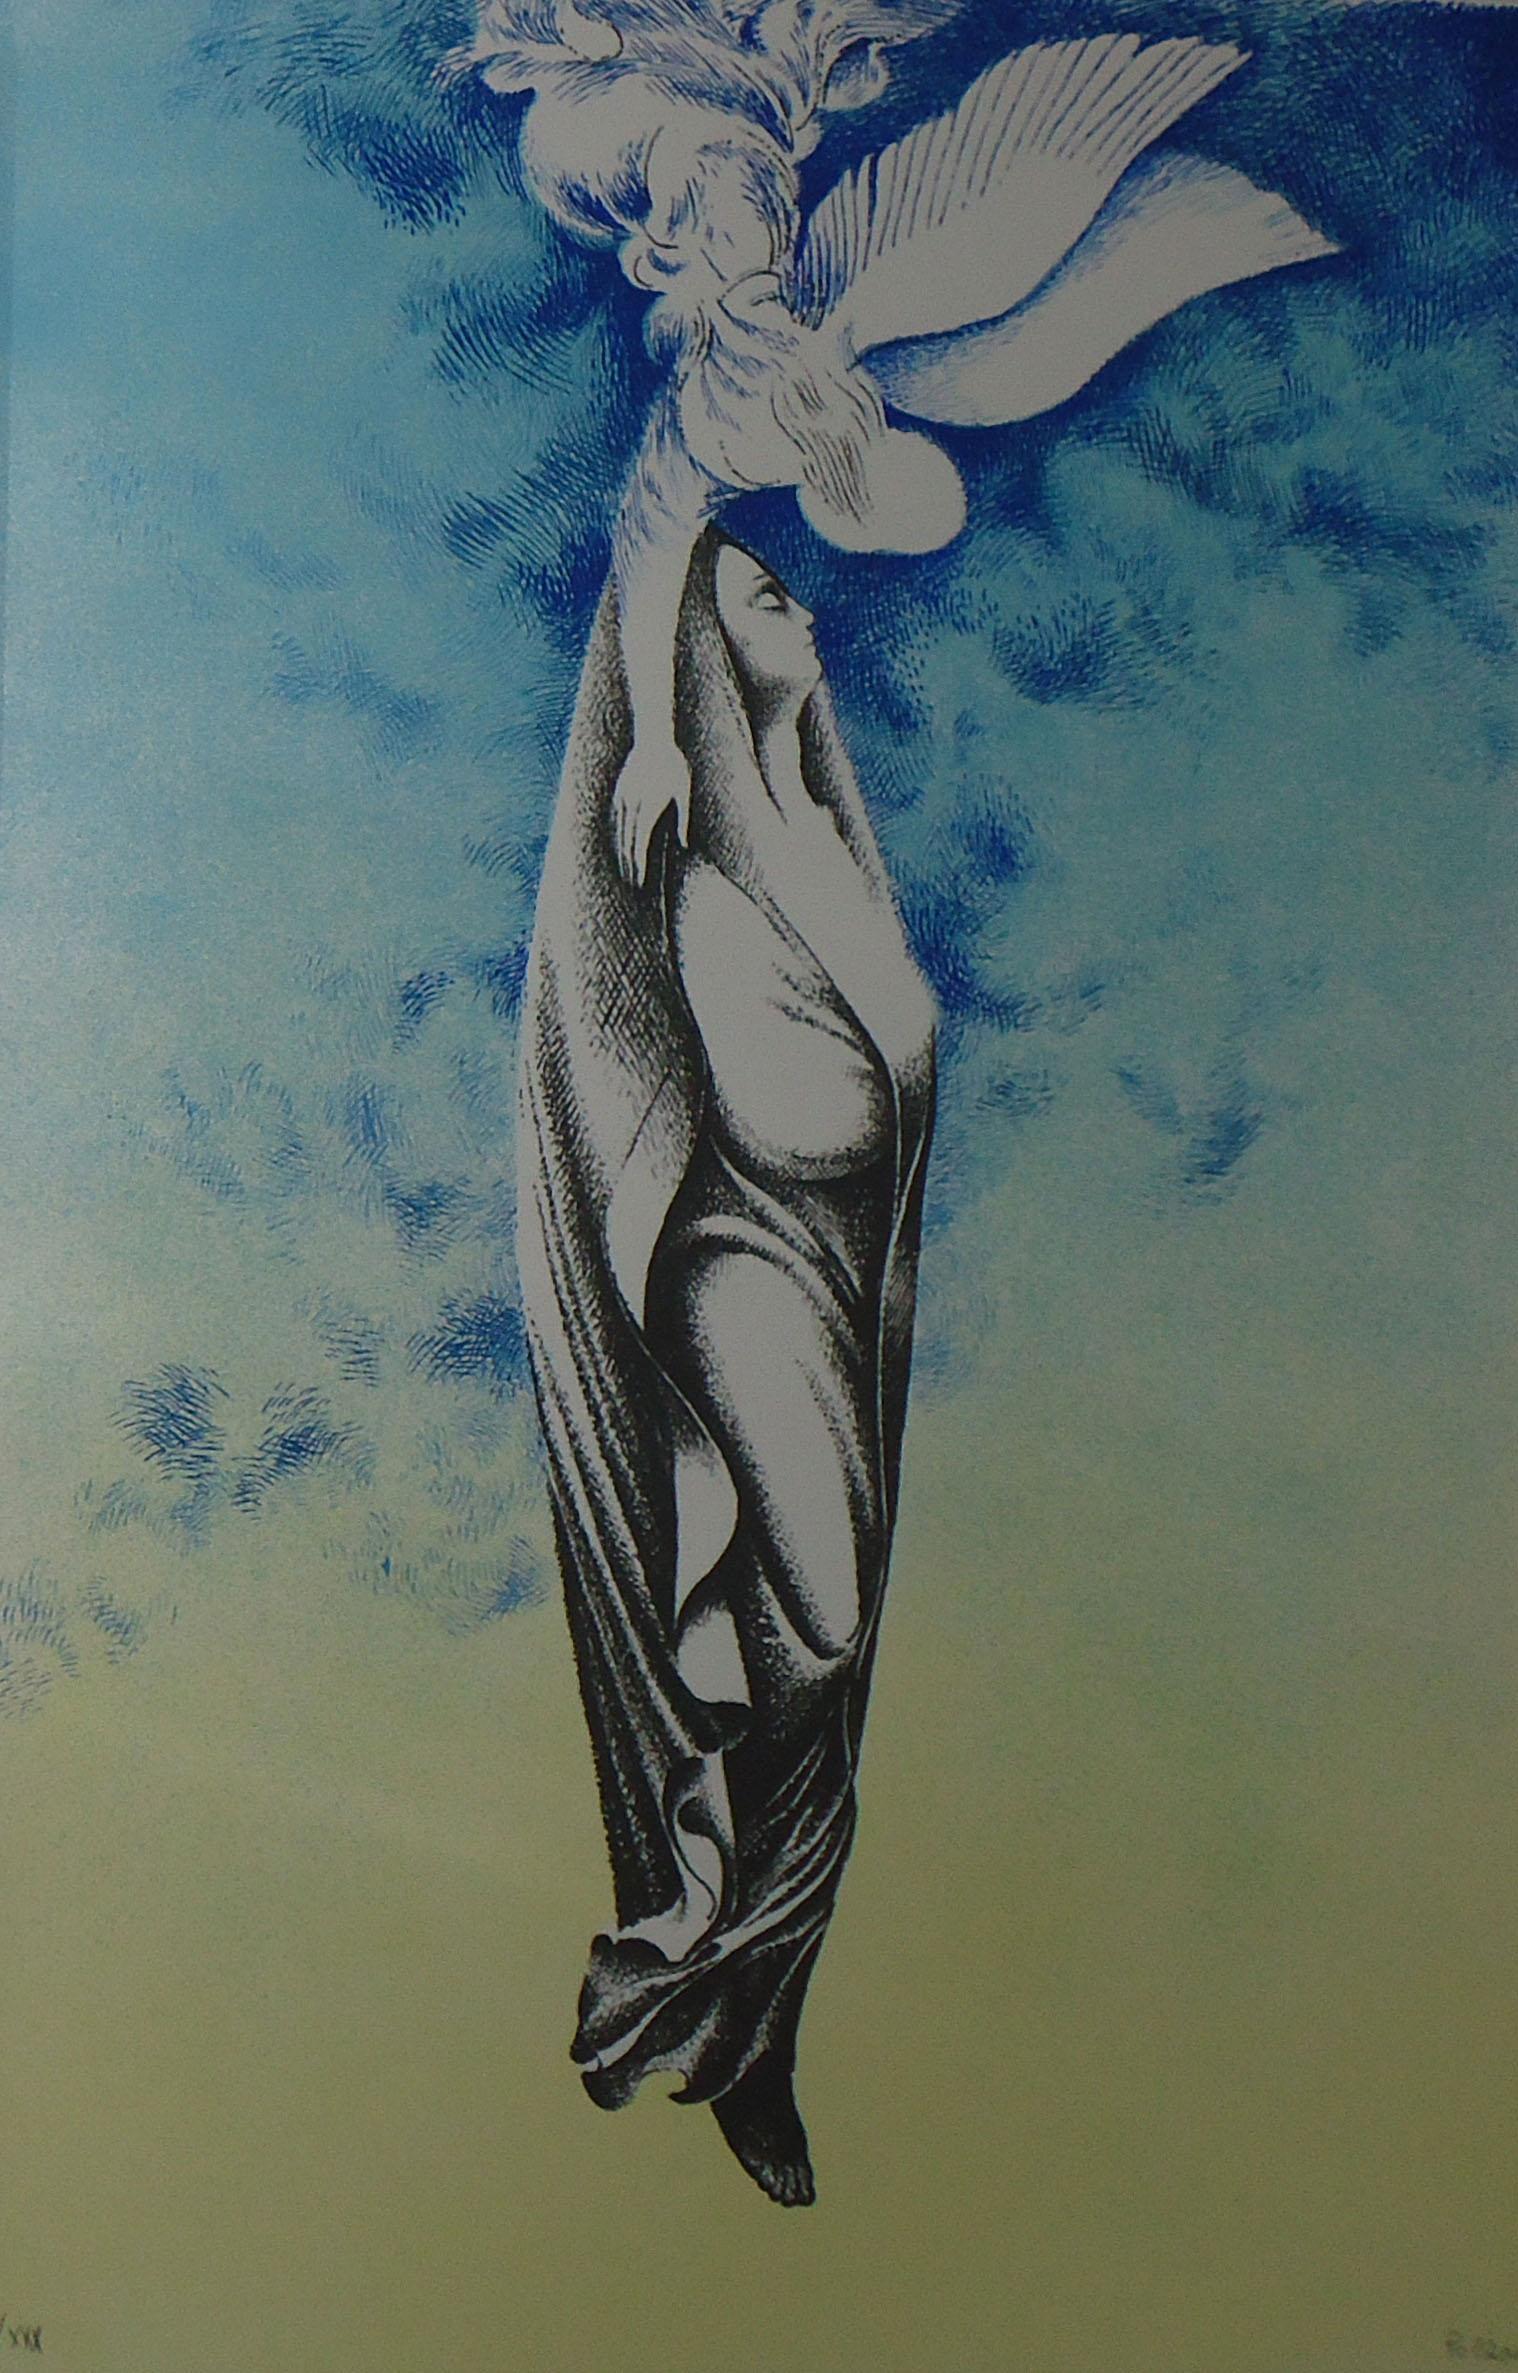 Giacomo Porzano - Assunzione al cielo